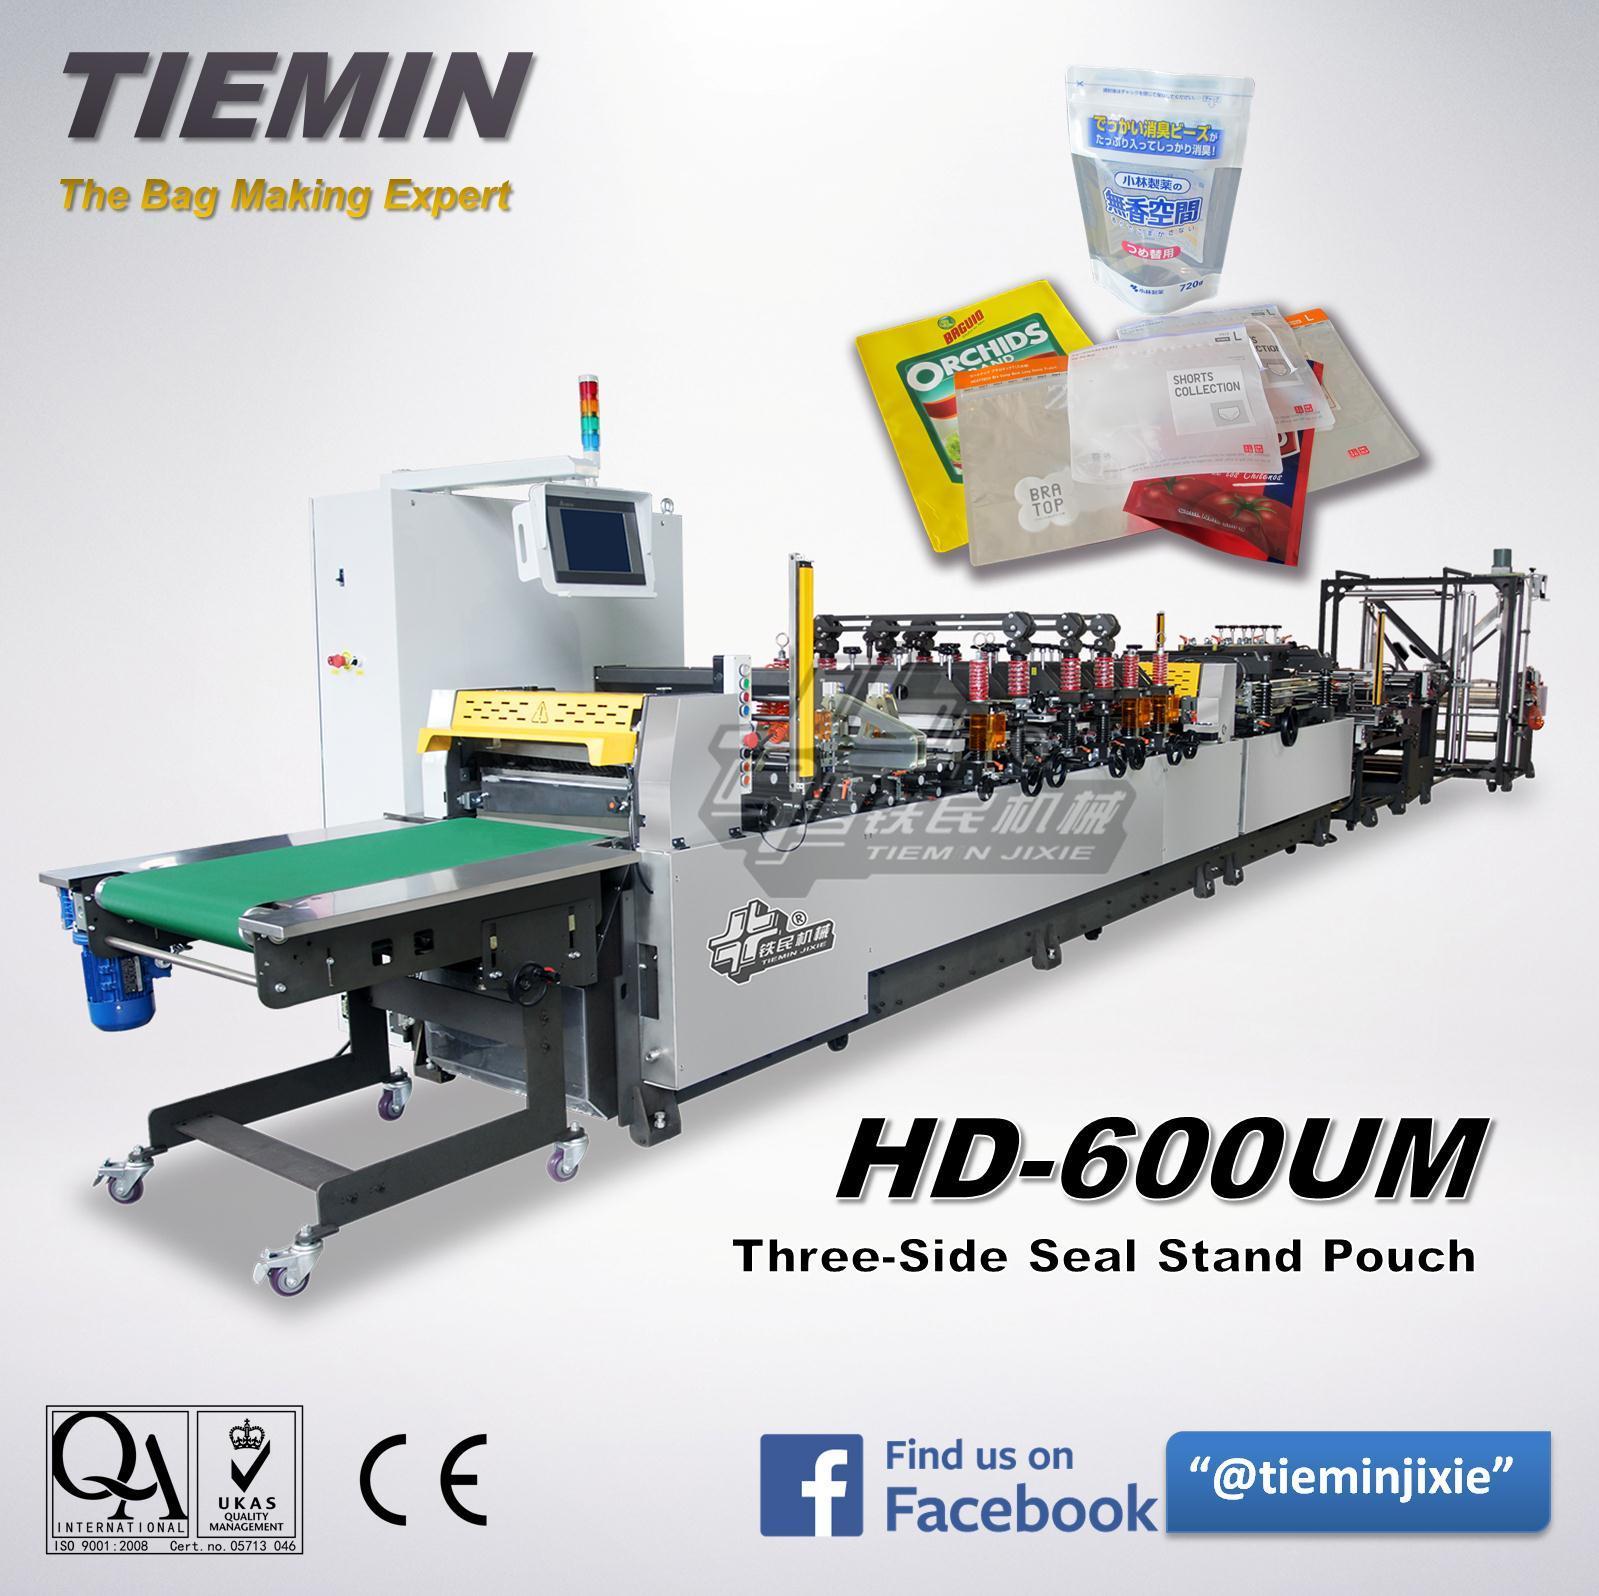 Tiemin High Quality High Speed Automatic Packaging Bag Machine HD-600bum